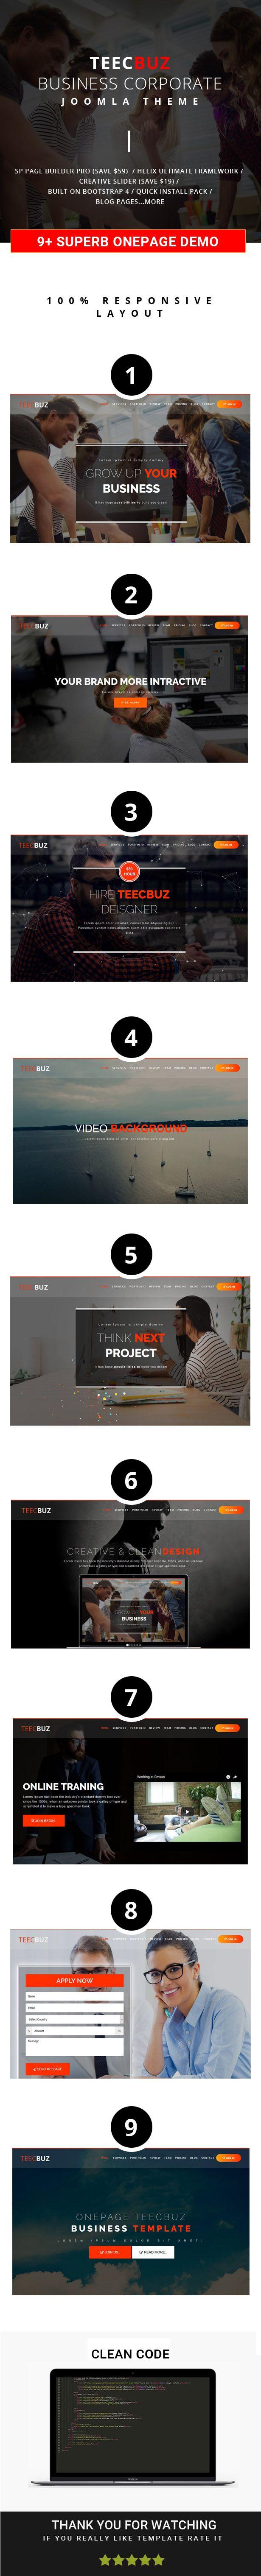 26 best Joomla Theme images on Pinterest